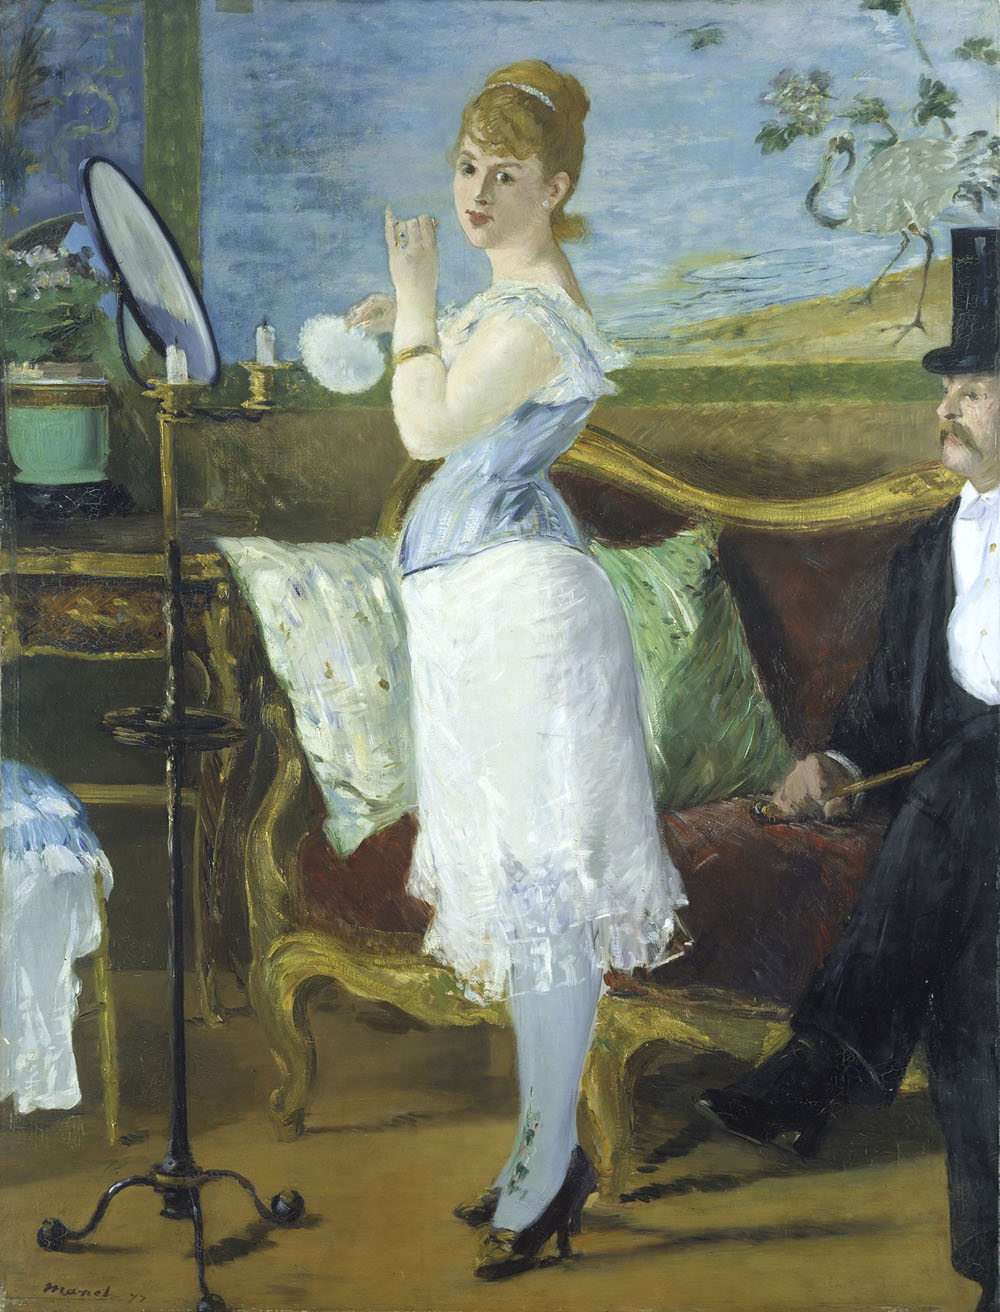 Édouard Manet (1832–1883) Nana, 1877 Öl auf Leinwand, 154 x 115 cm Hamburger Kunsthalle © bpk/Hamburger Kunsthalle Foto: Elke Walford